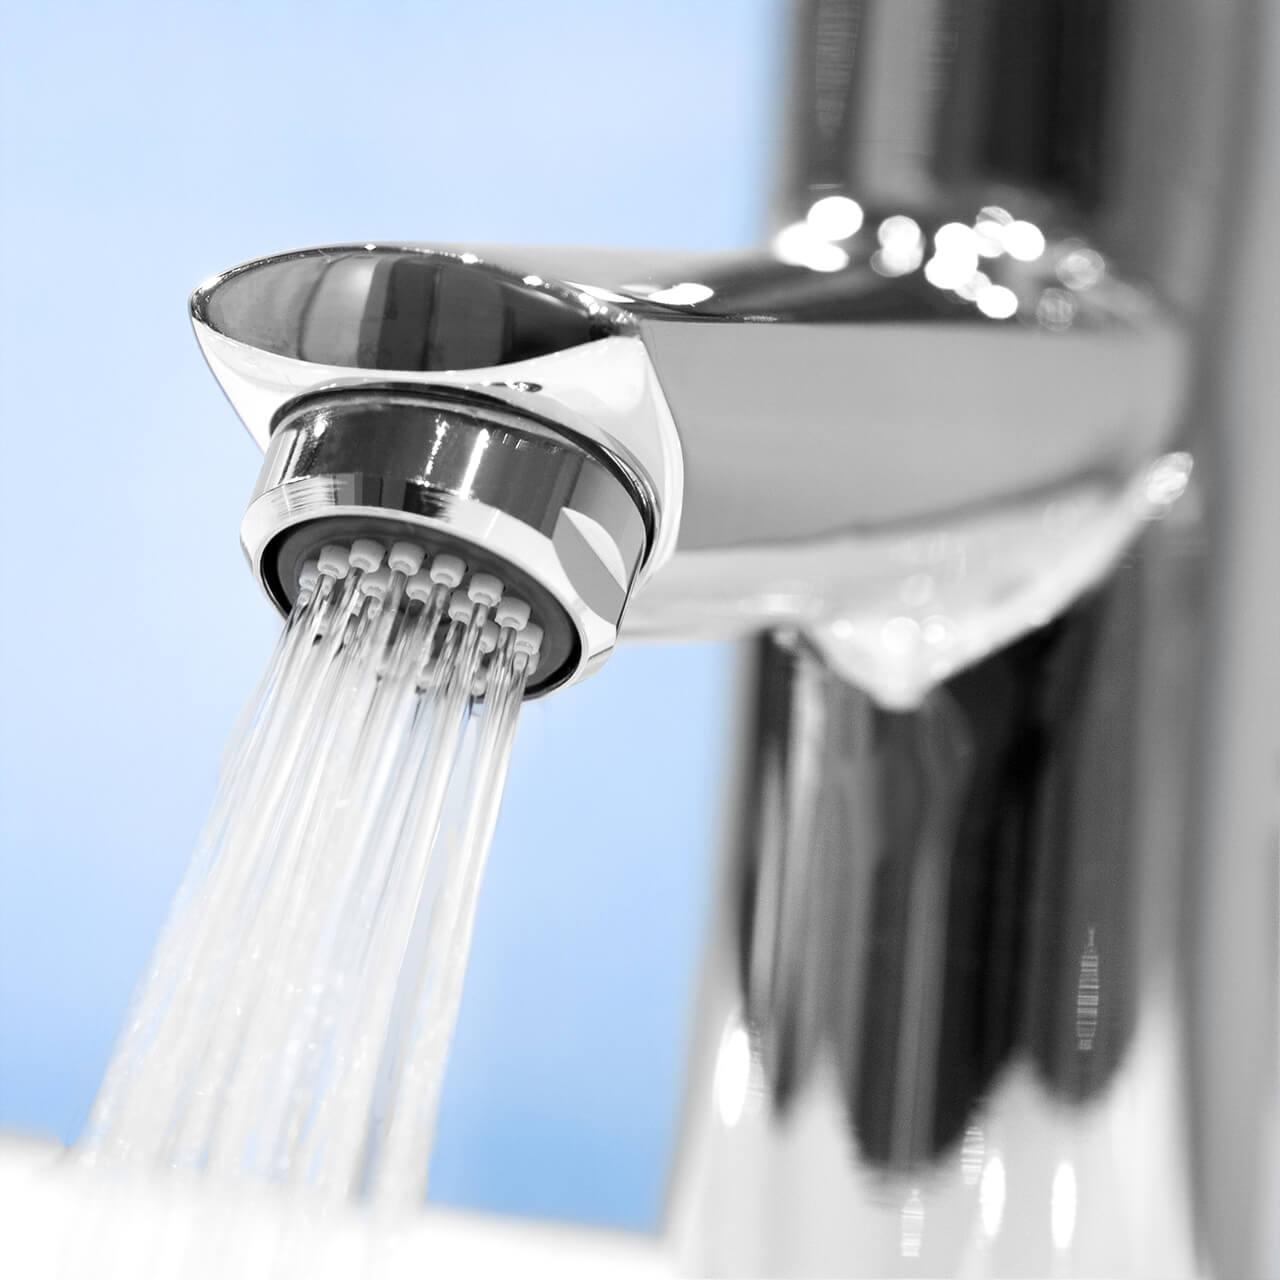 Aireador de ahorro de agua Neoperl Spray 1.9 l/min - Rosca